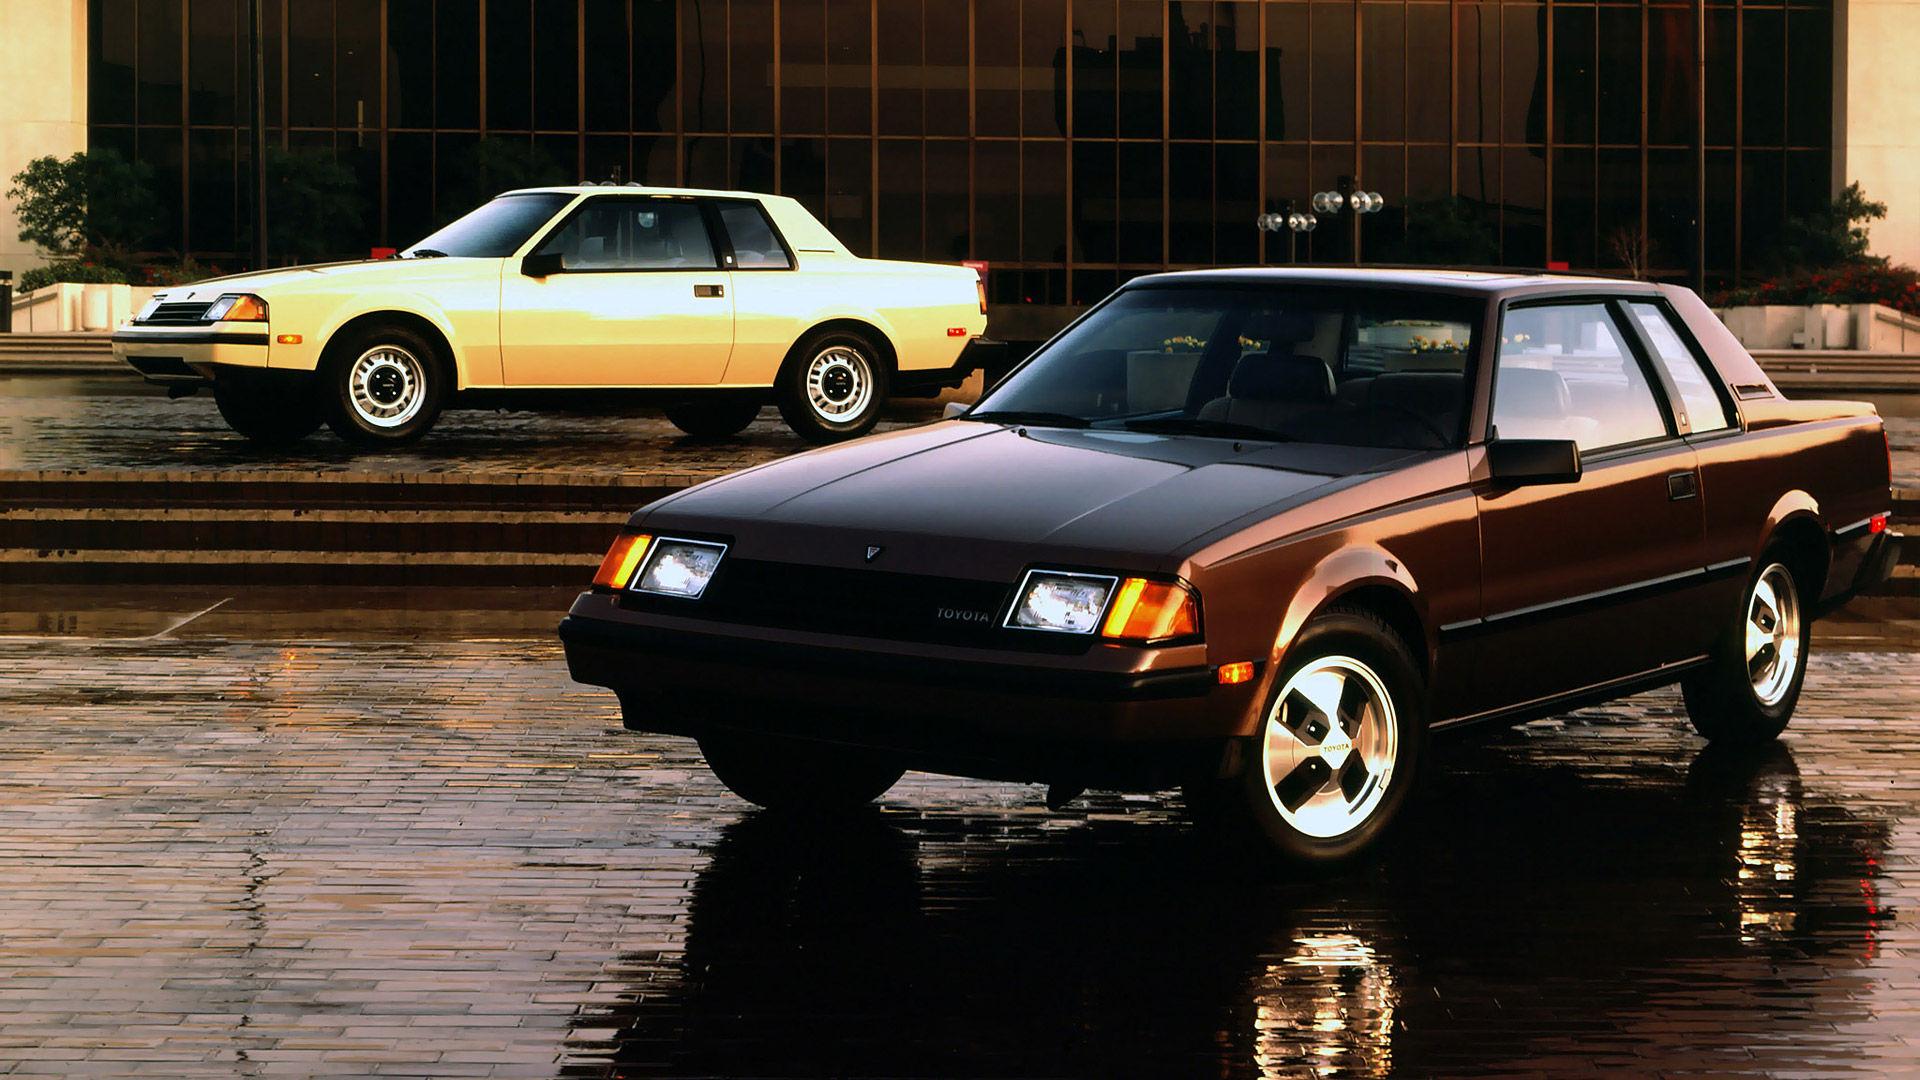 1981 Toyota Celica Coupe